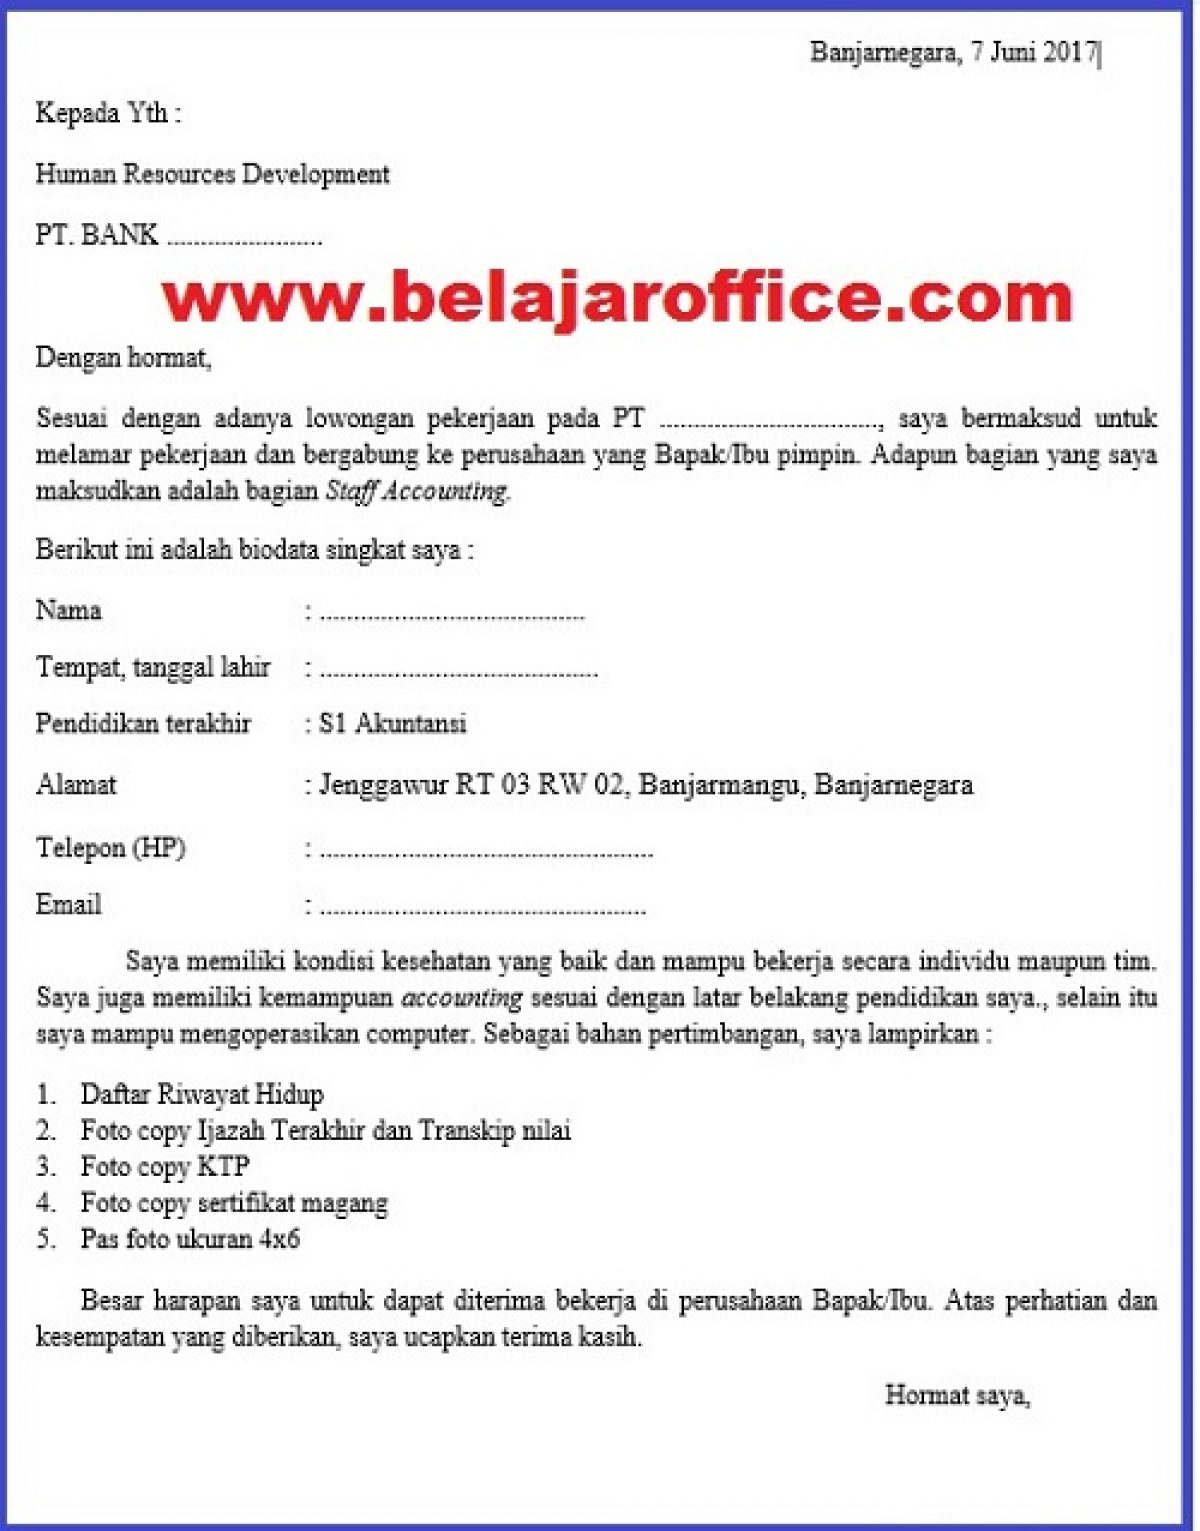 Contoh Surat Lamaran Kerja Di Bank Belajar Office